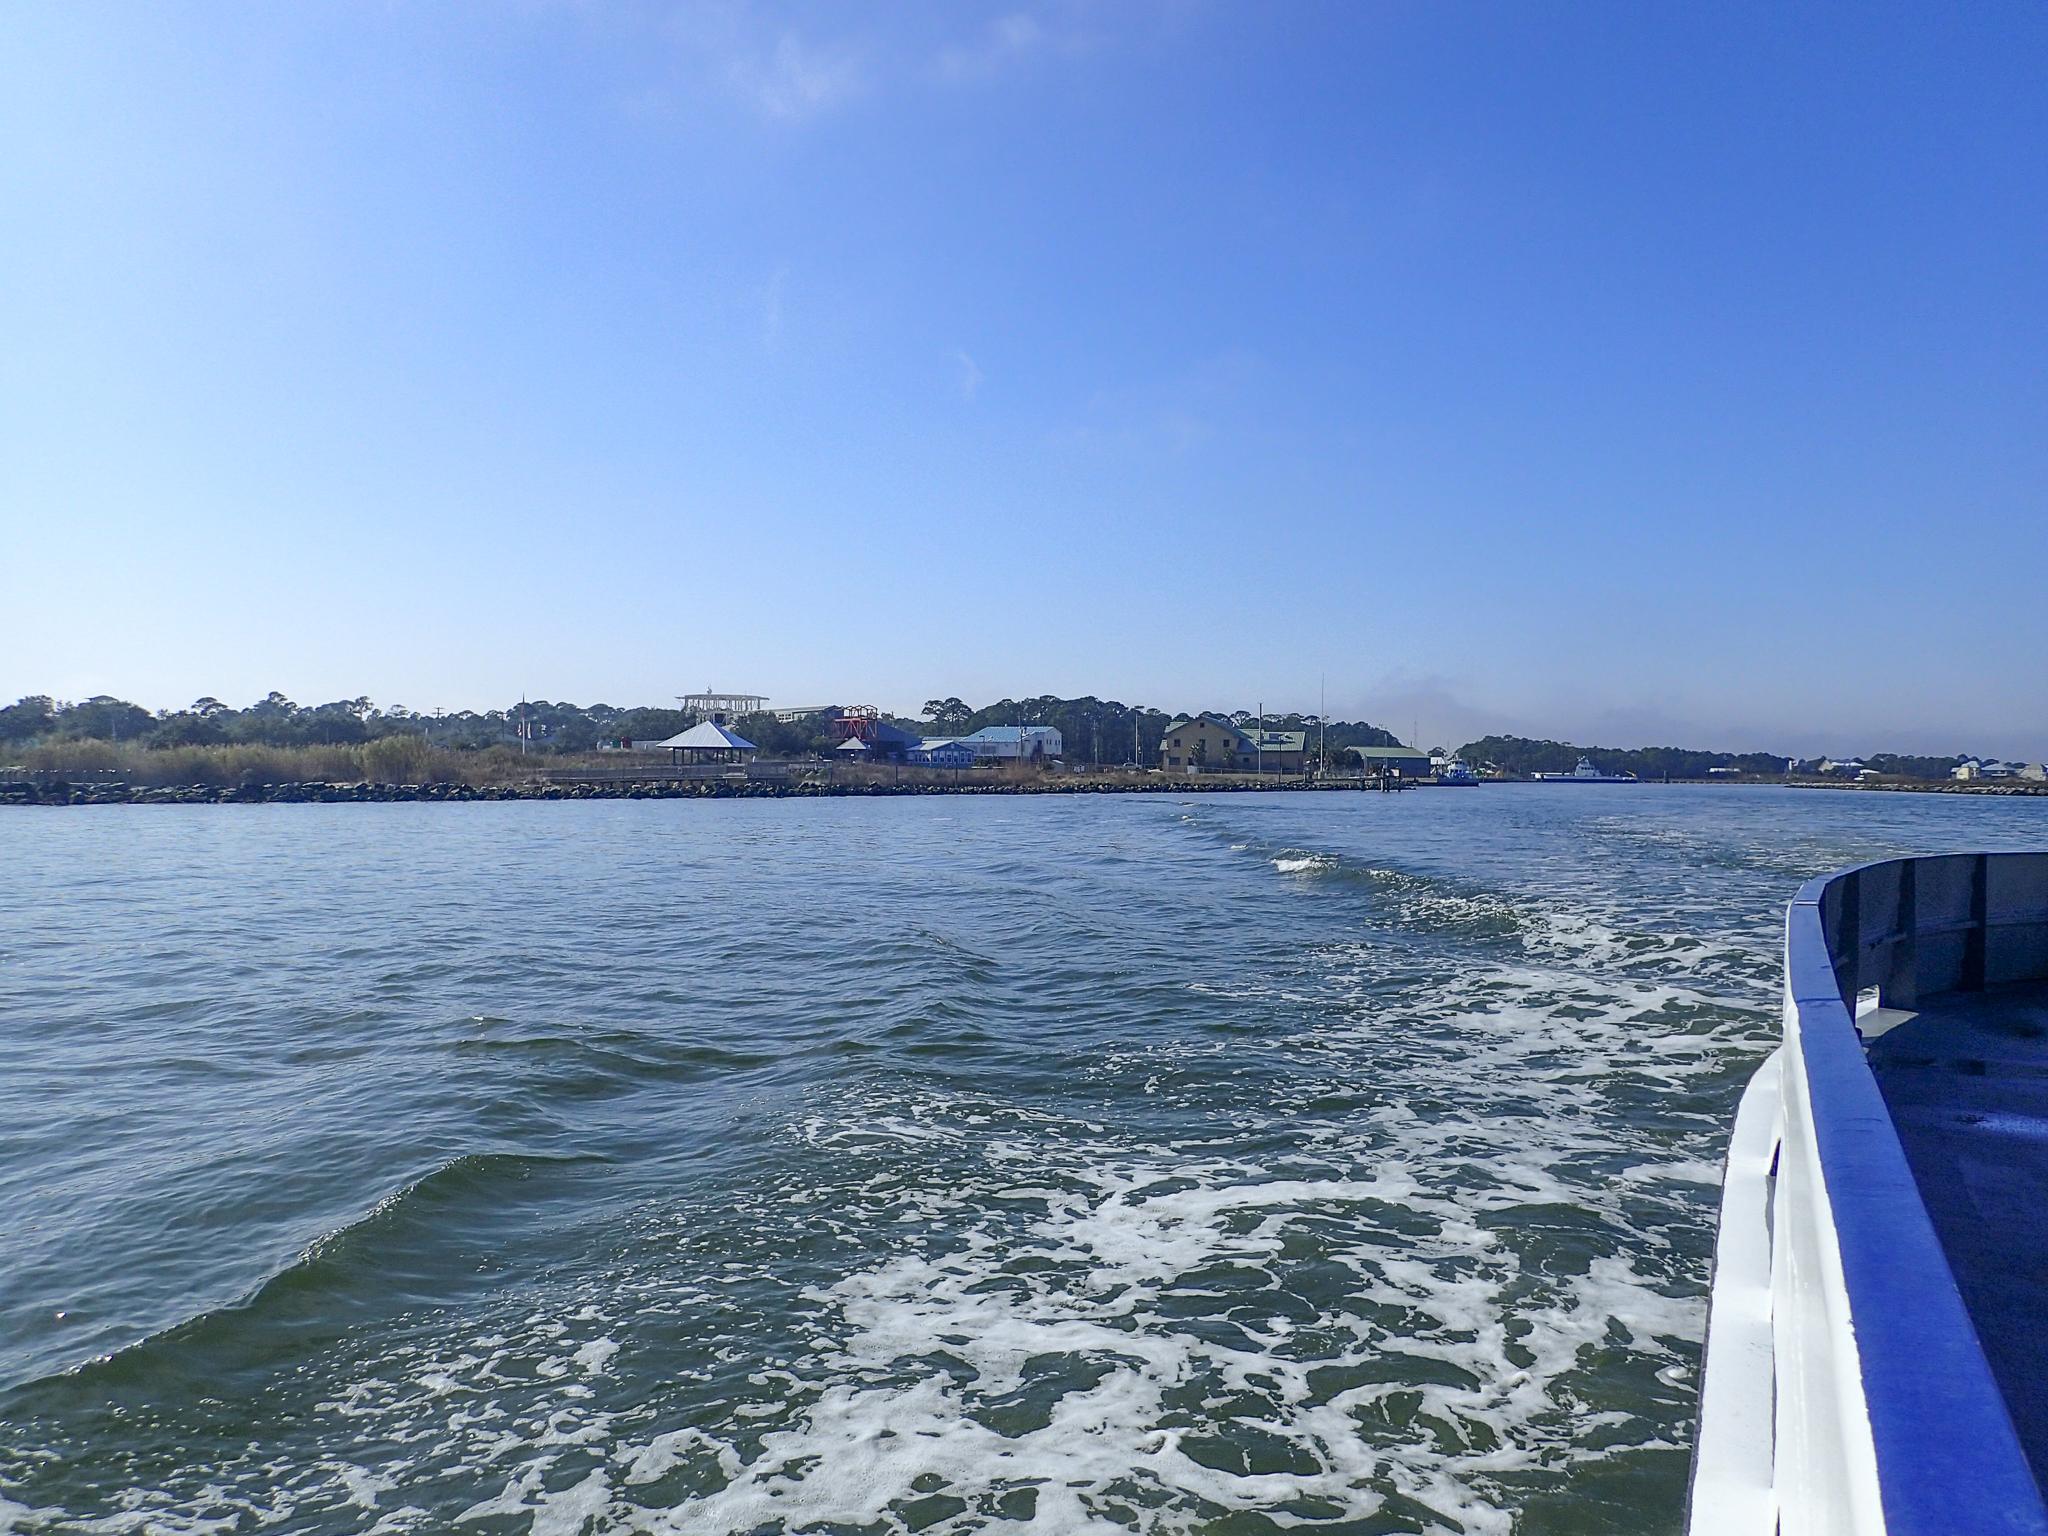 The Dauphin Island to Fort Morgan ferry, Alabama